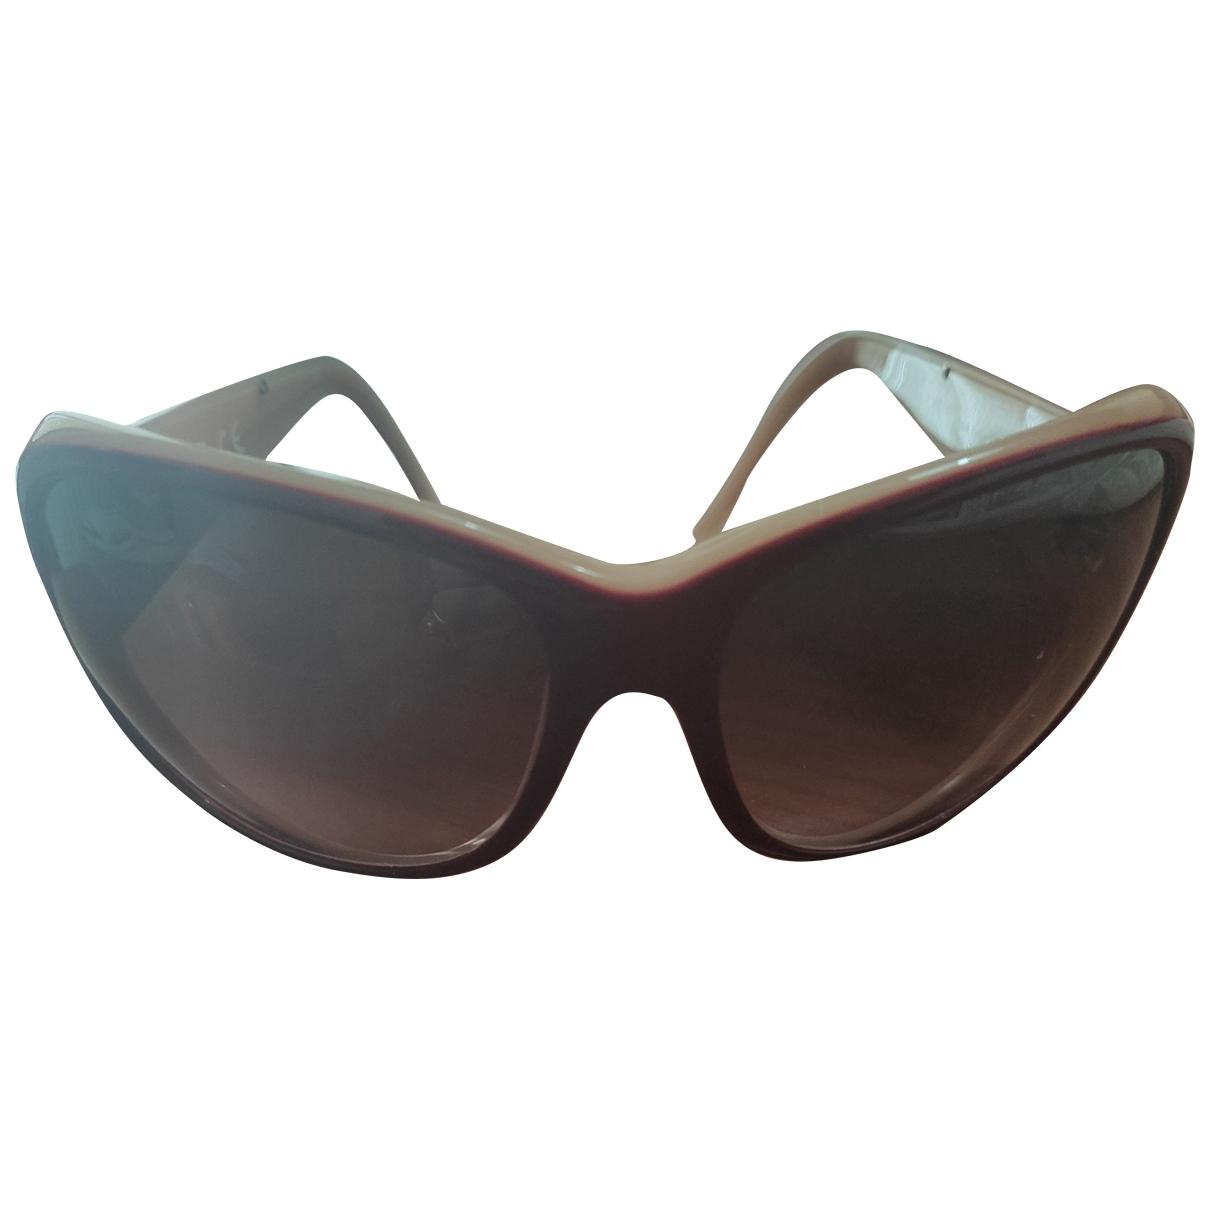 Just Cavalli \N Burgundy Sunglasses for Women \N